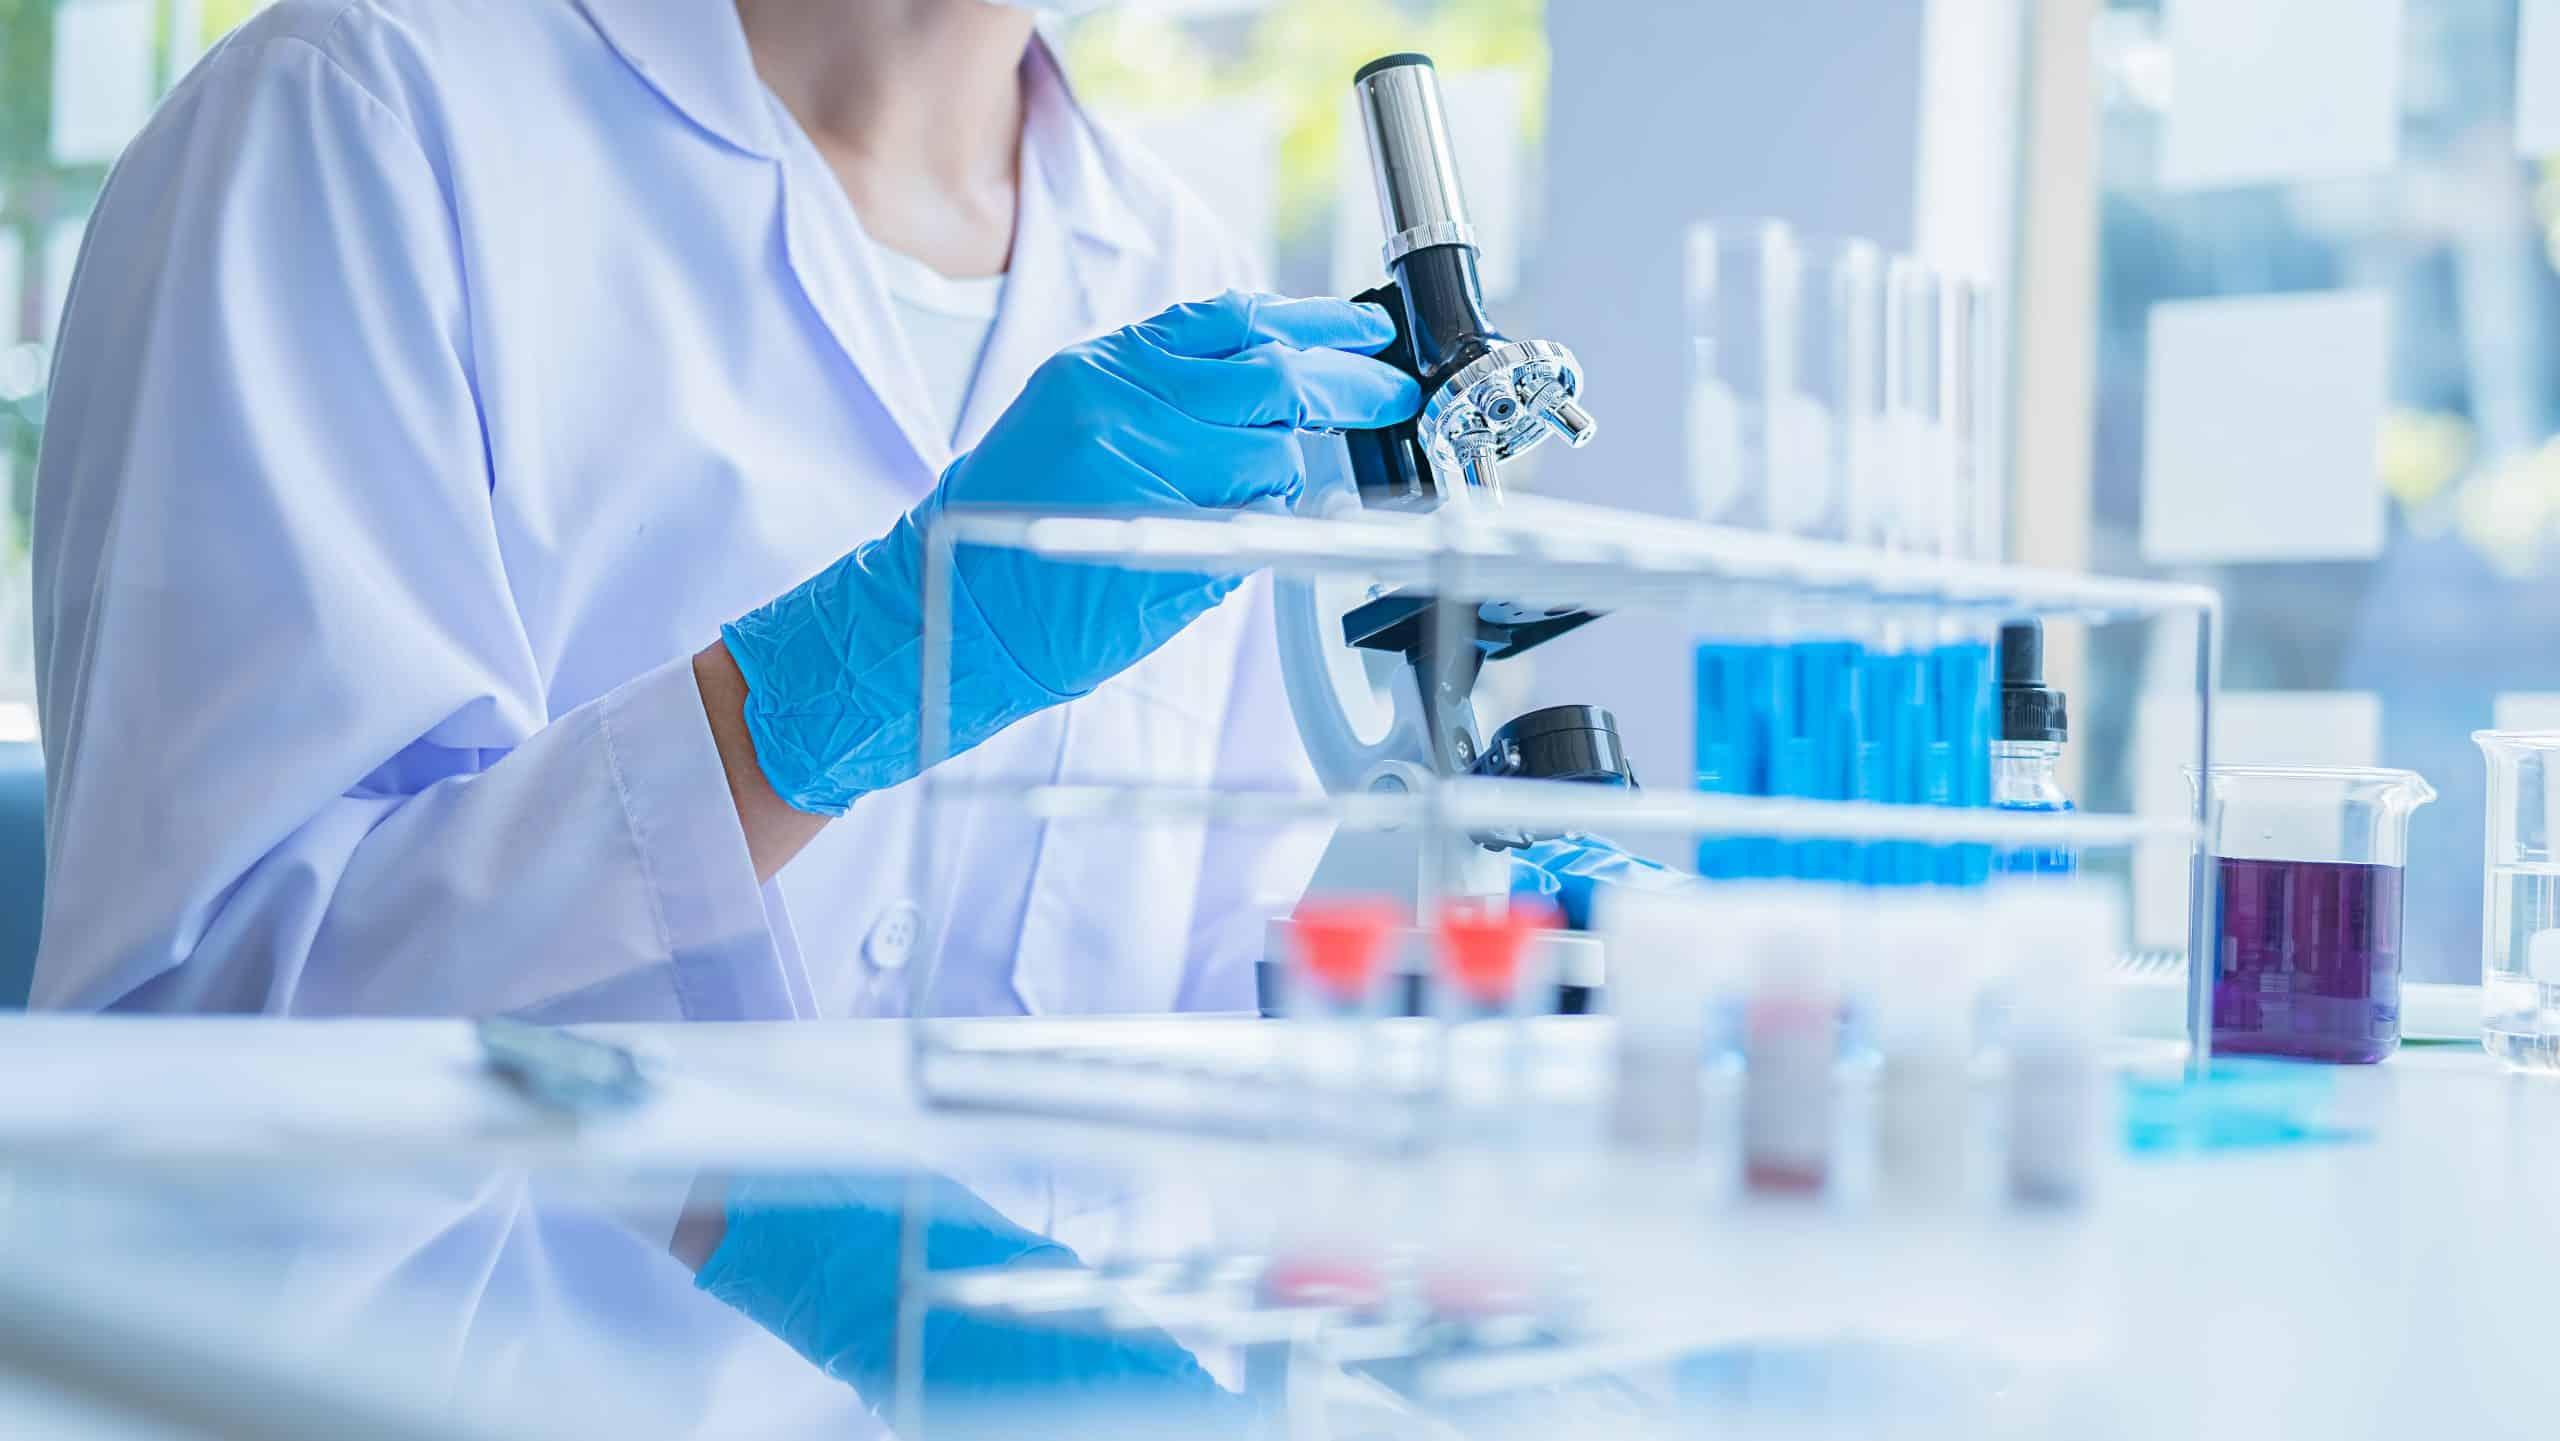 Rapid Growing Biotechnology Organization